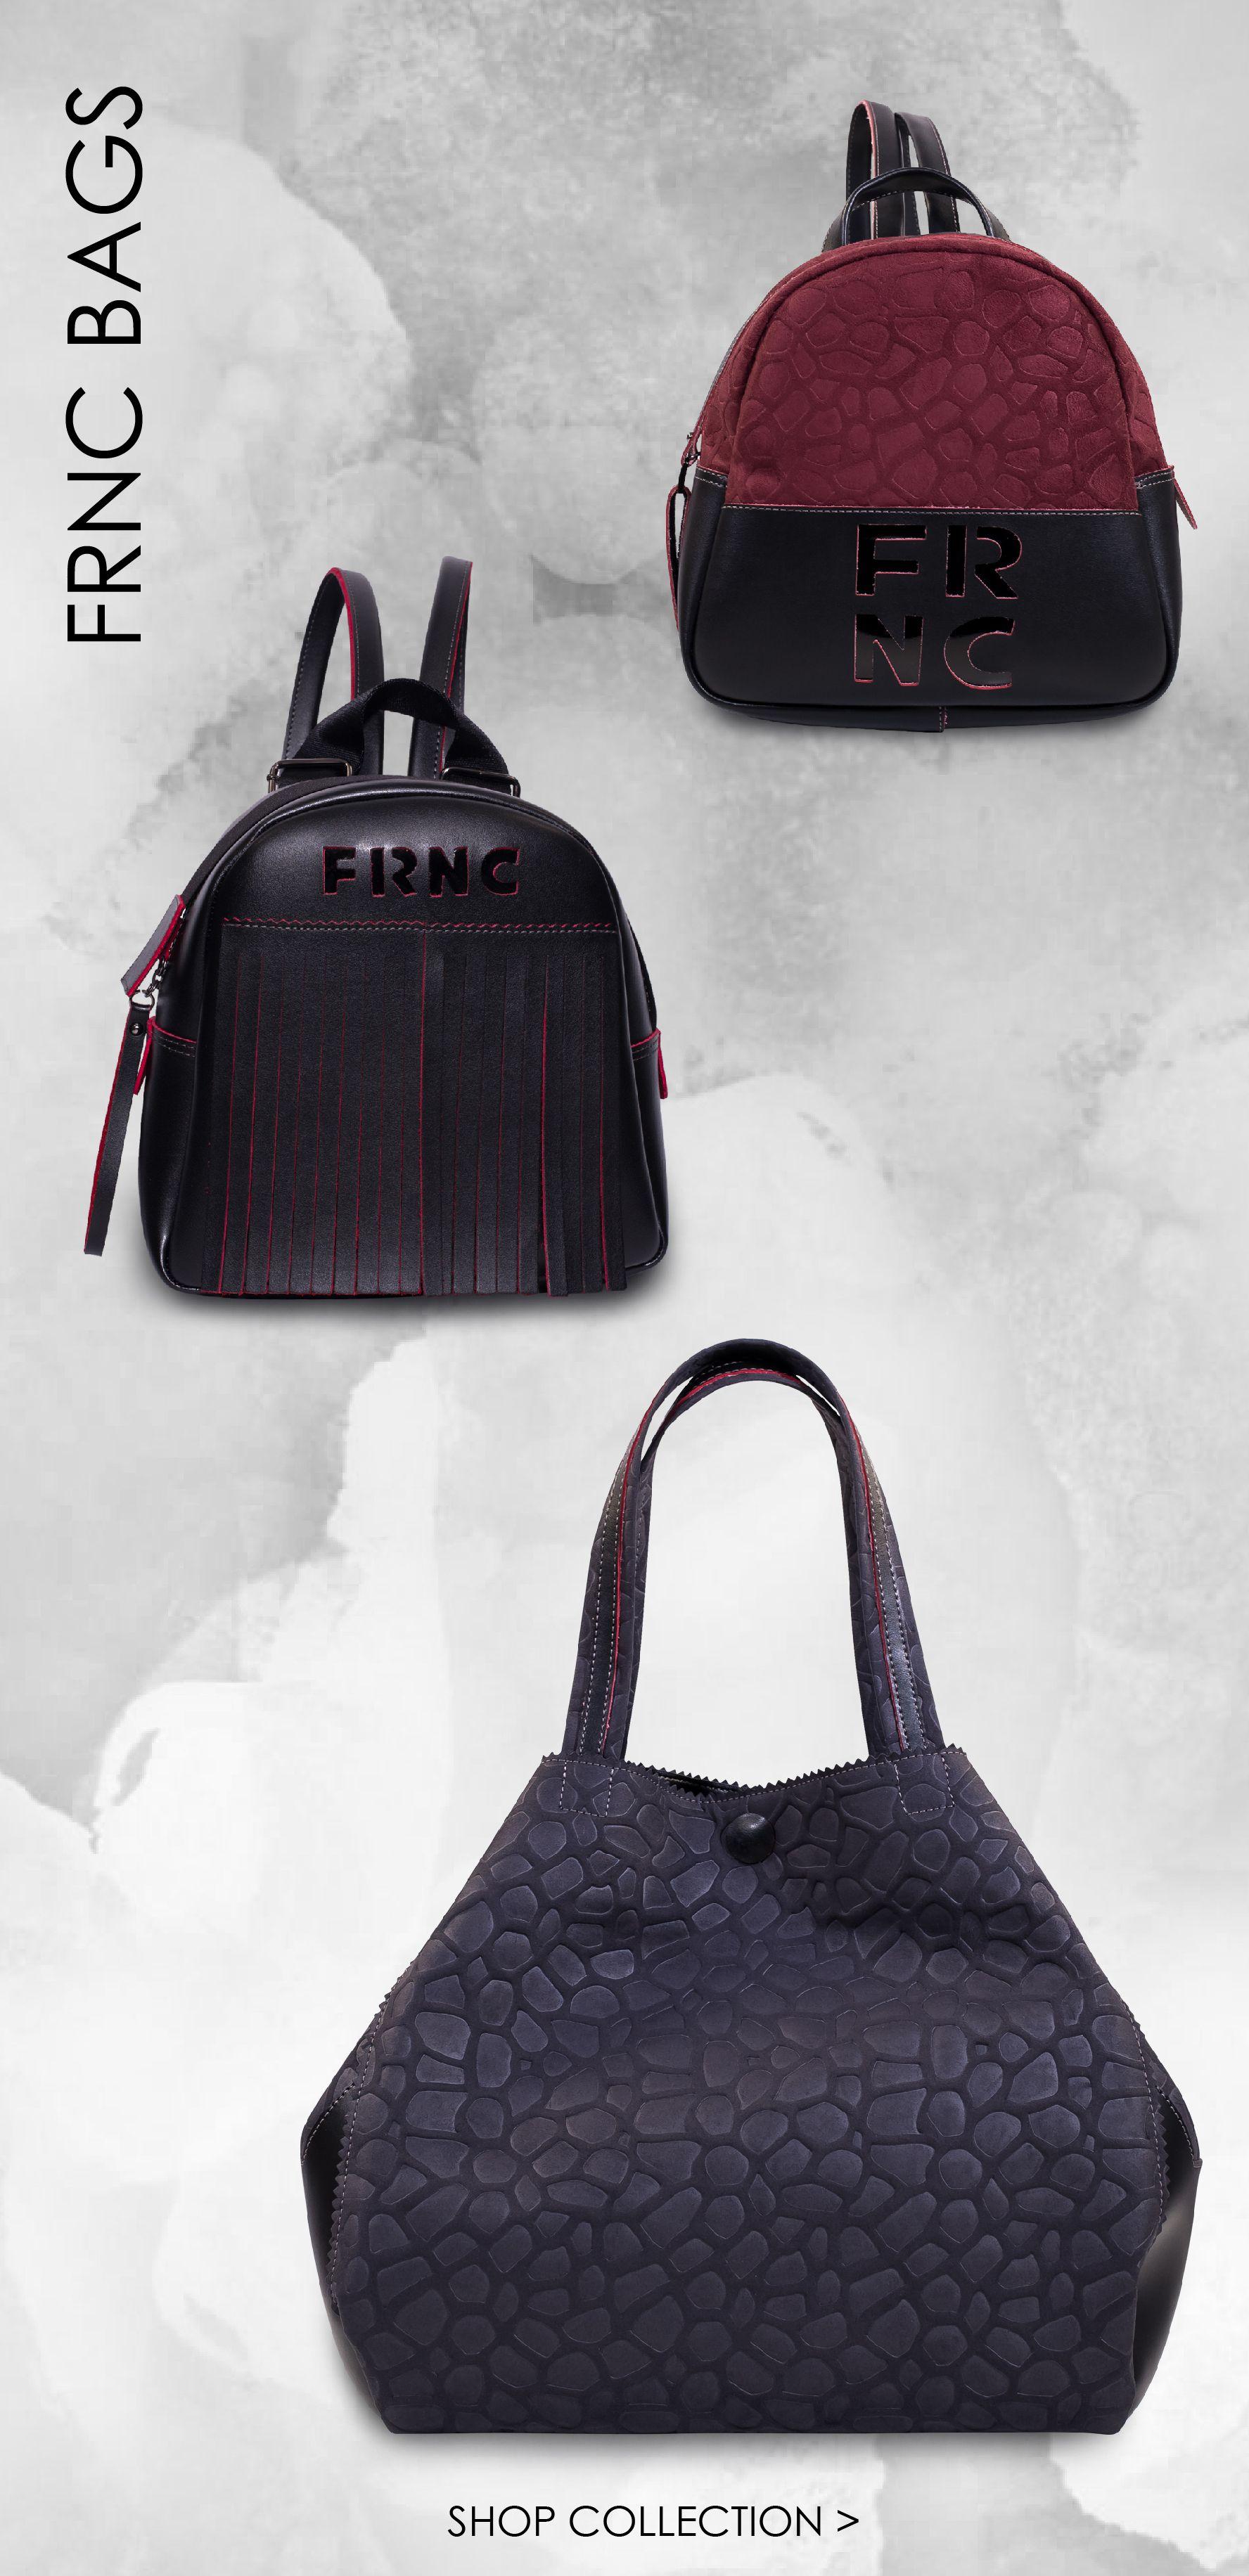 FRNC big shoulderbag for style o´clock Black | Bags